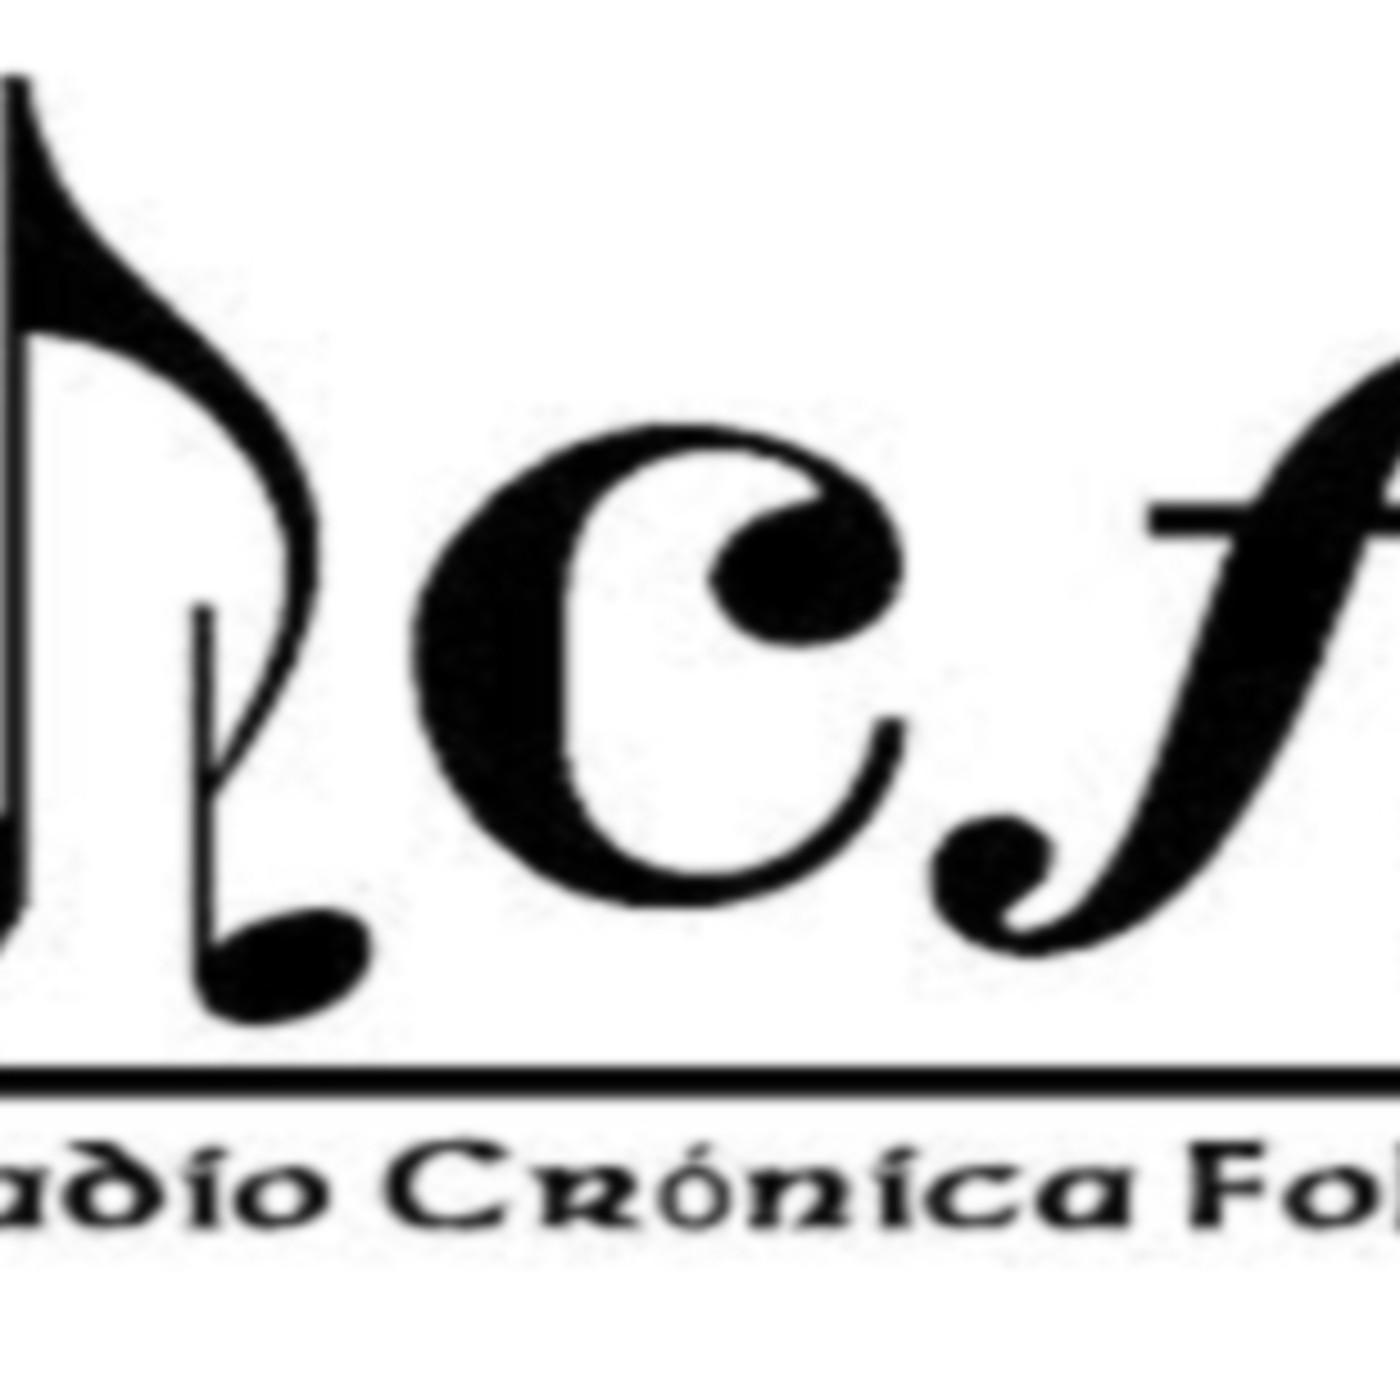 Palabras - RCFM TEMPORADA 2020 - 2021 -